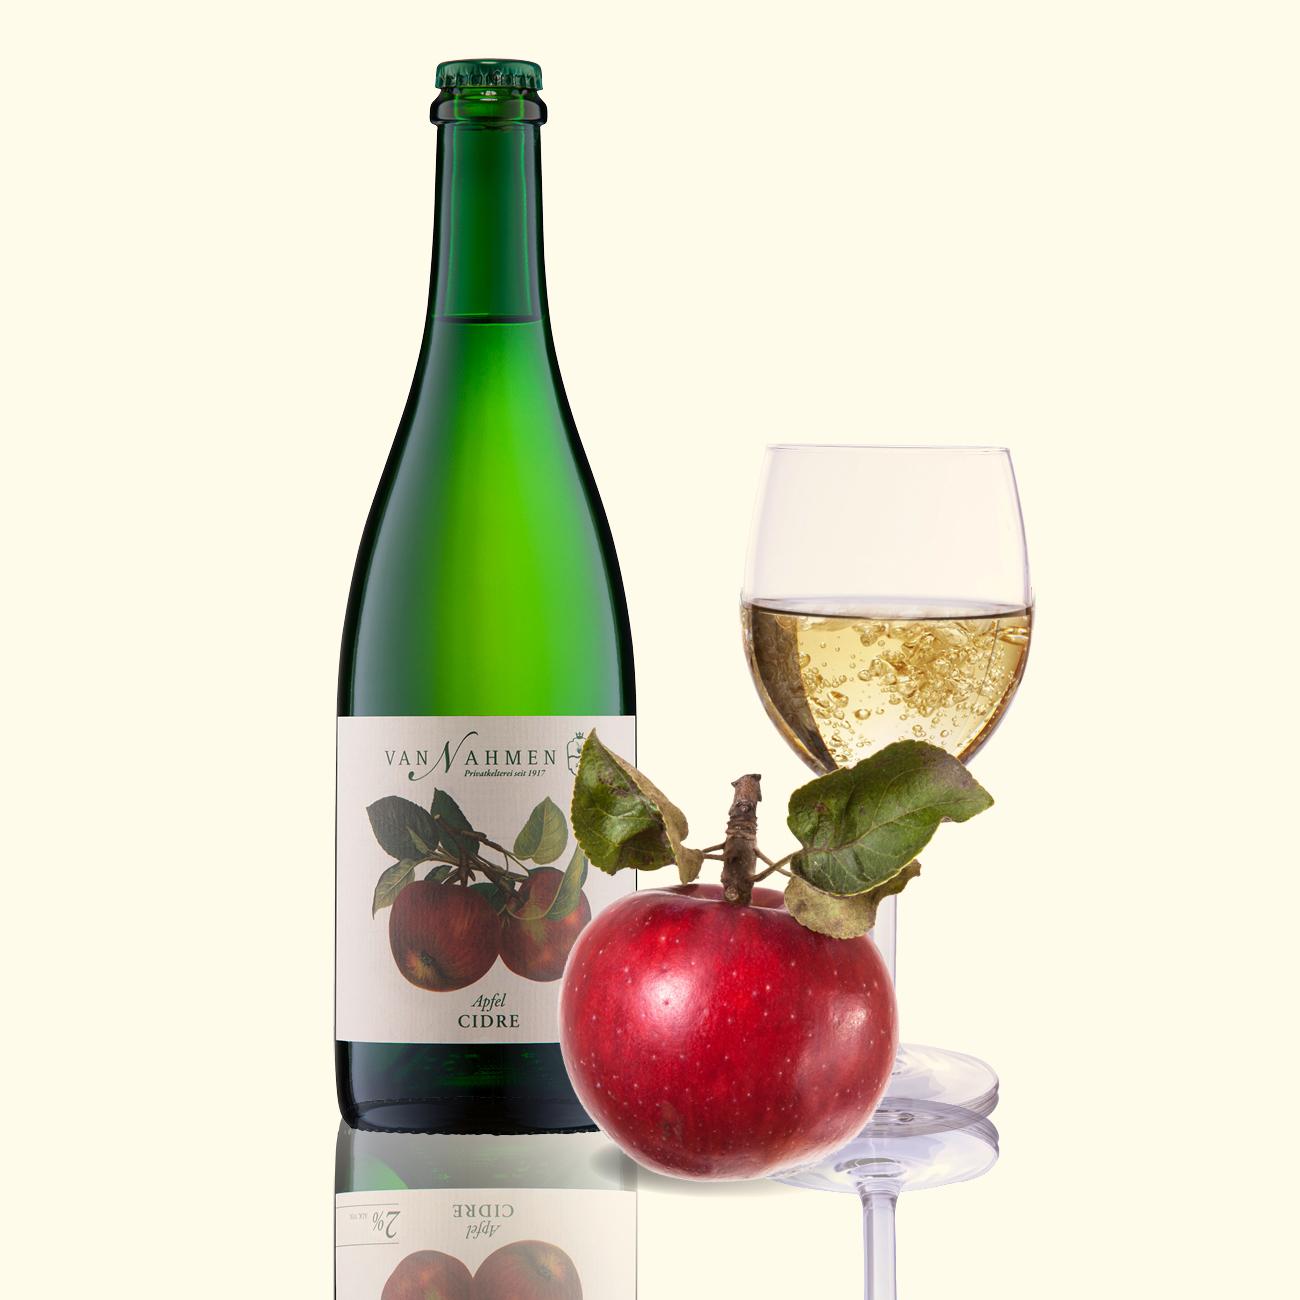 Apple Cider 2% alcohol